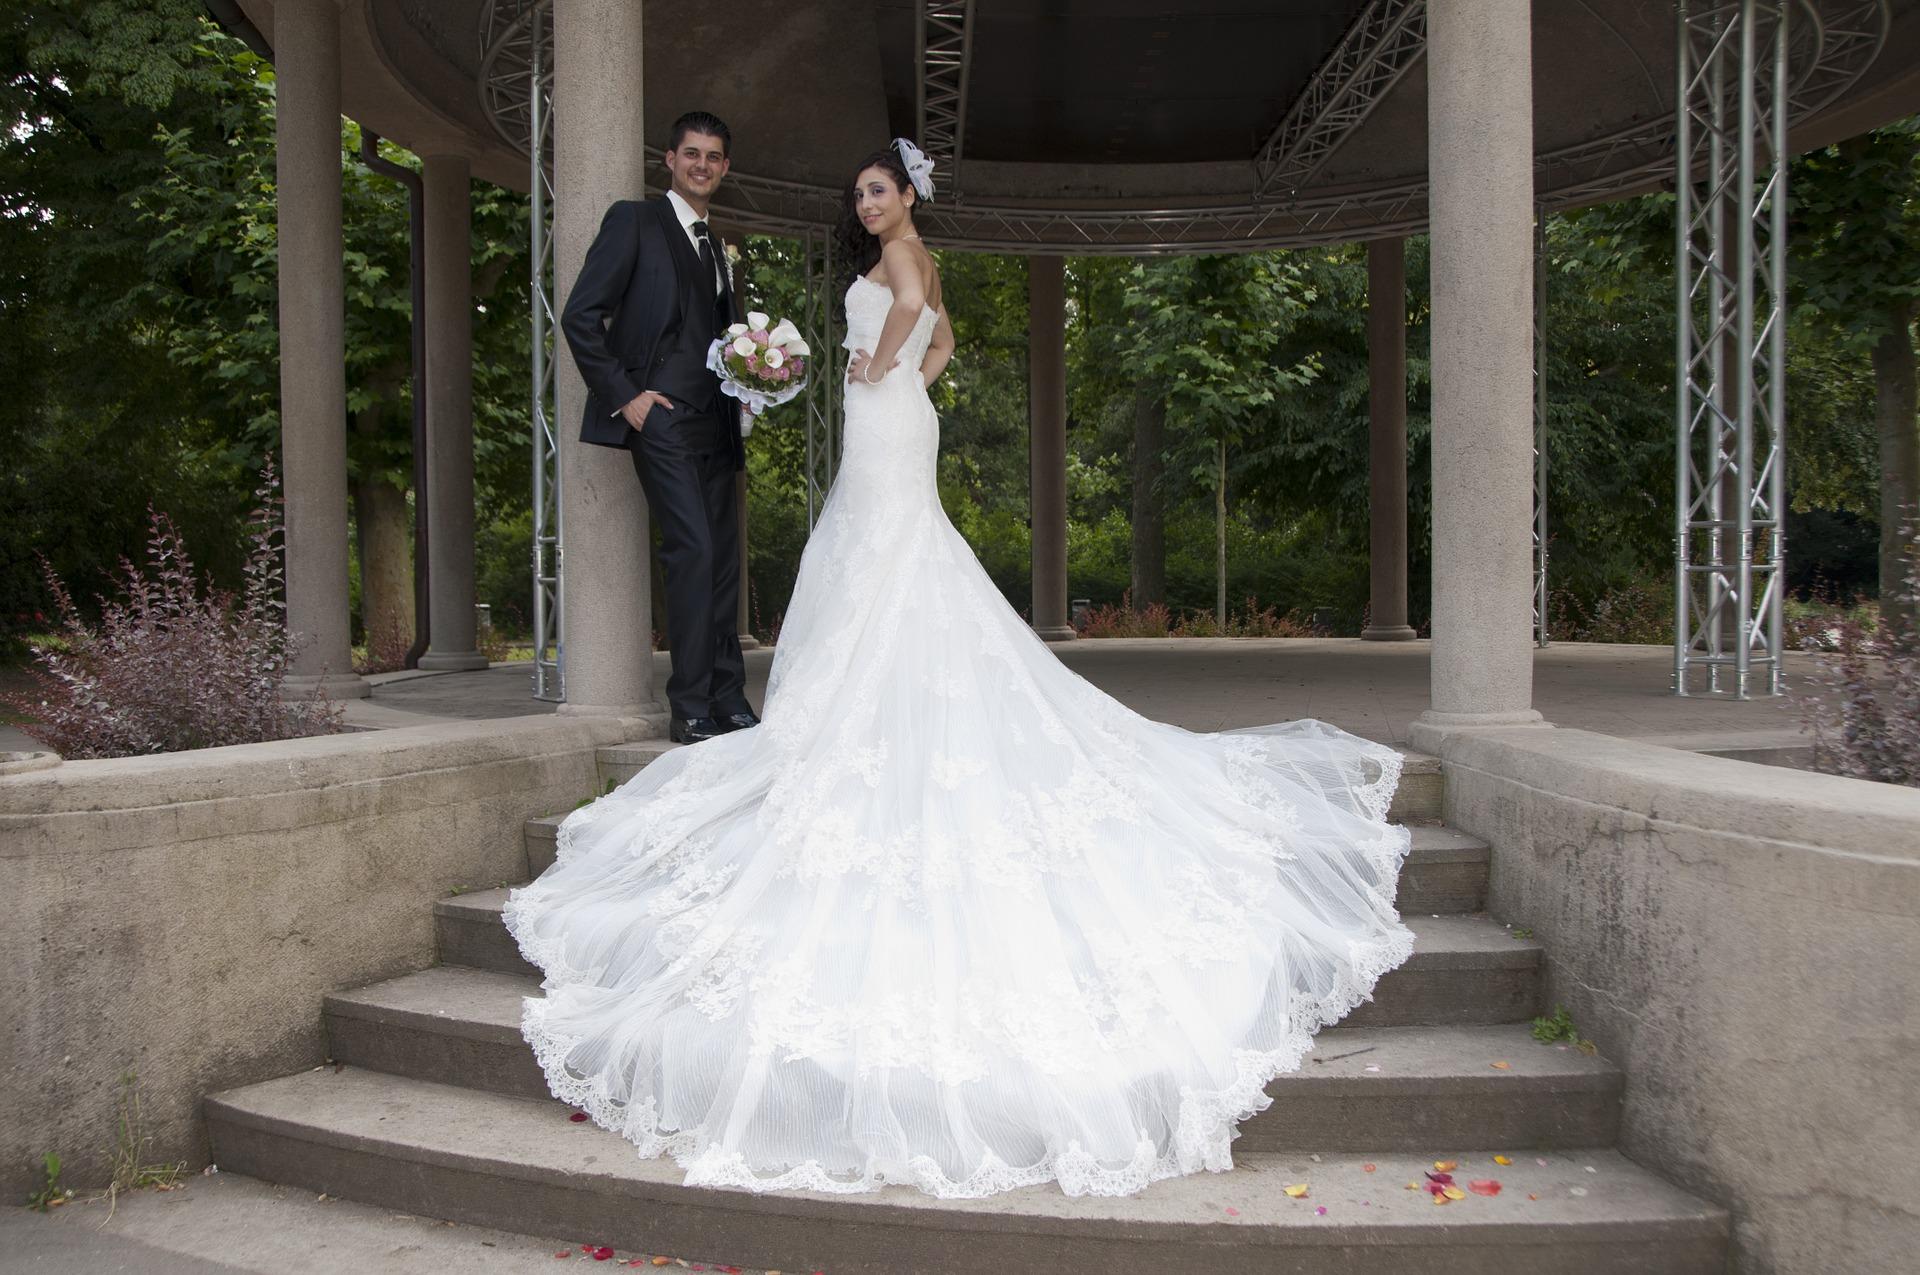 wedding-1417512_1920